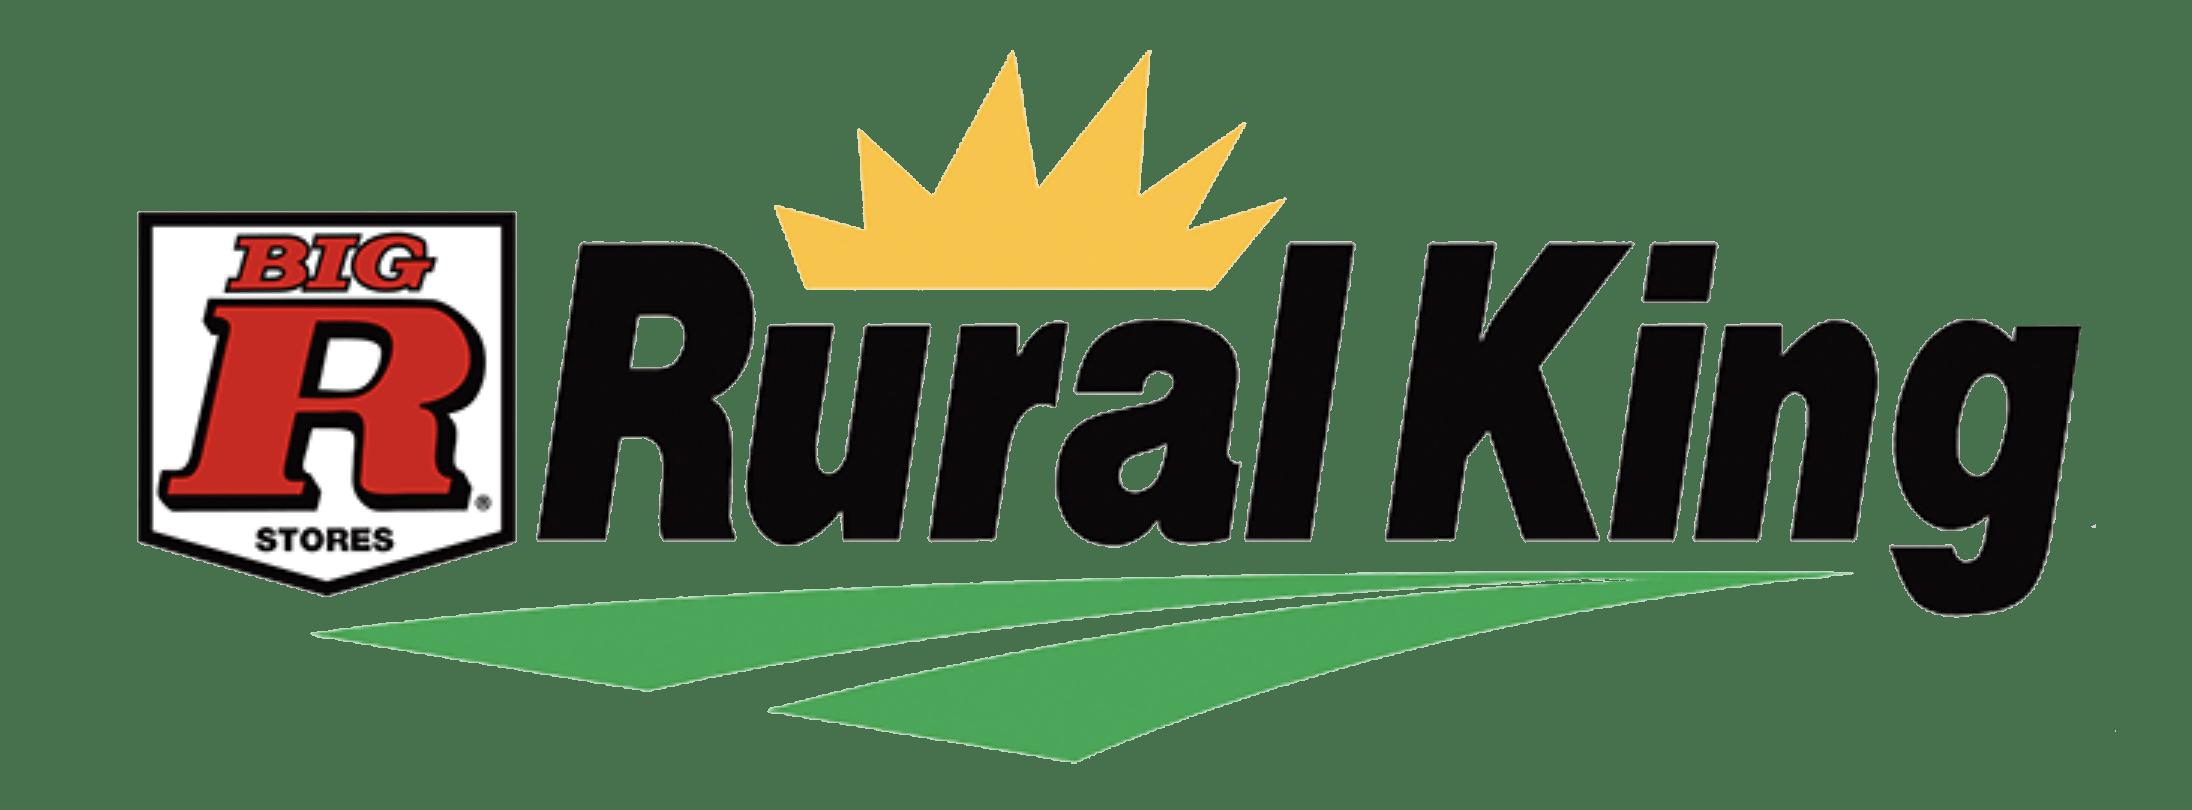 big r rural king